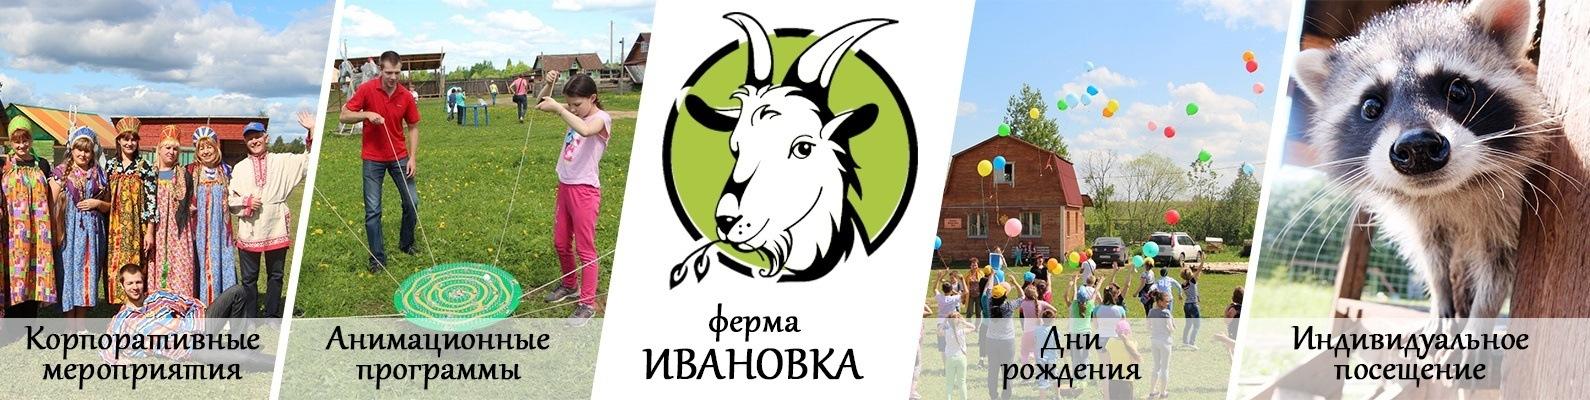 Туристическая ферма «Ивановка»   ВКонтакте